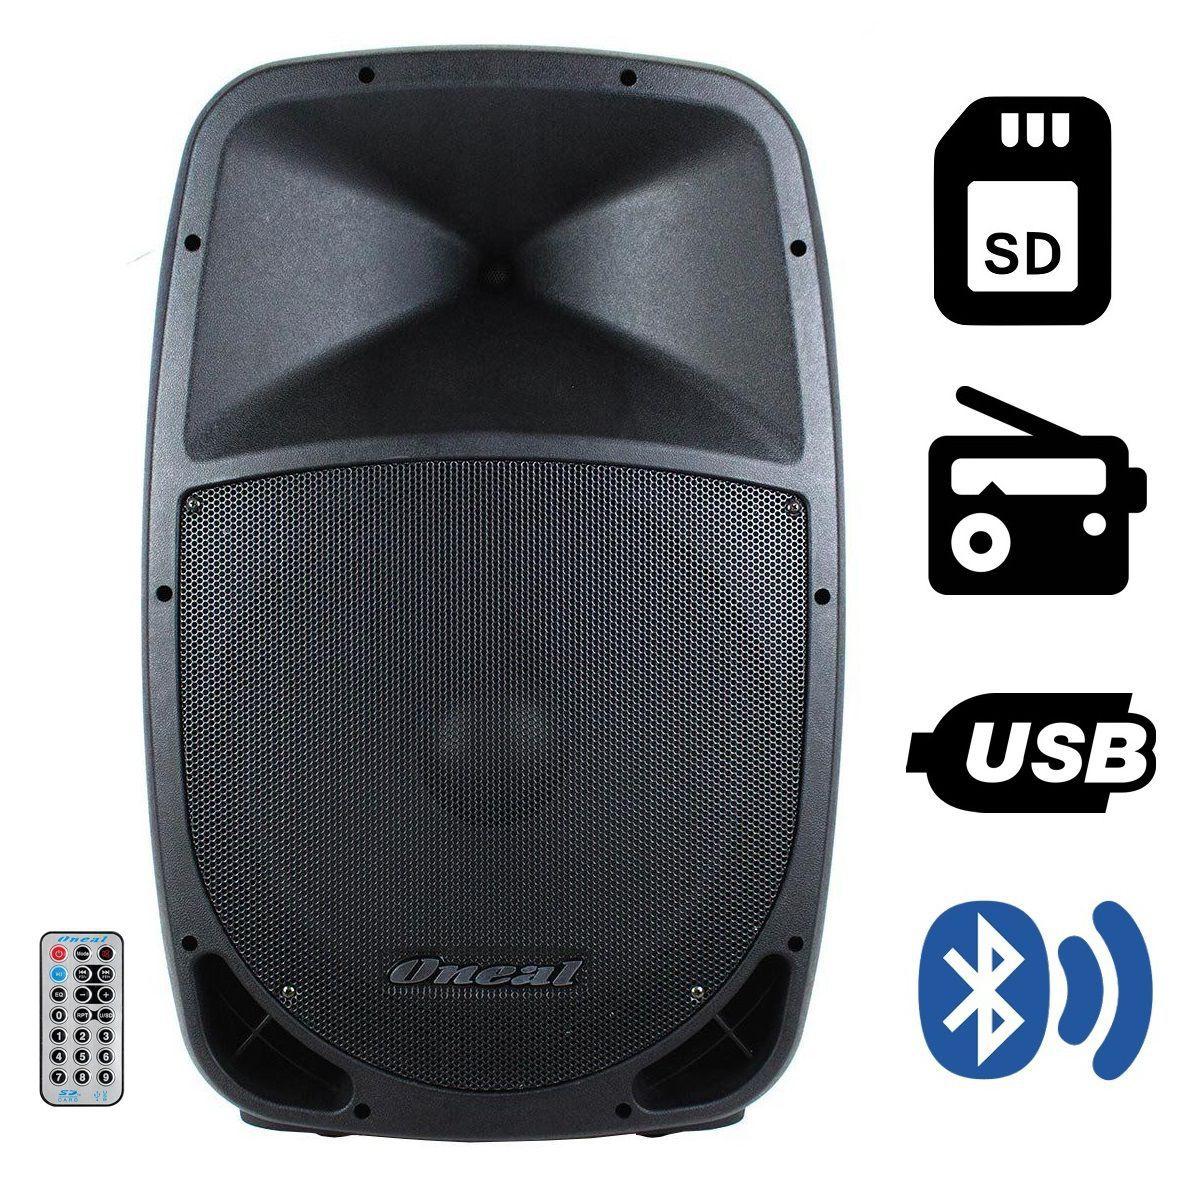 Kit Caixa Ativa Passiva Oneal Opb1112 Ob1112 + Microfone Vokal Vla42 E Pedestal